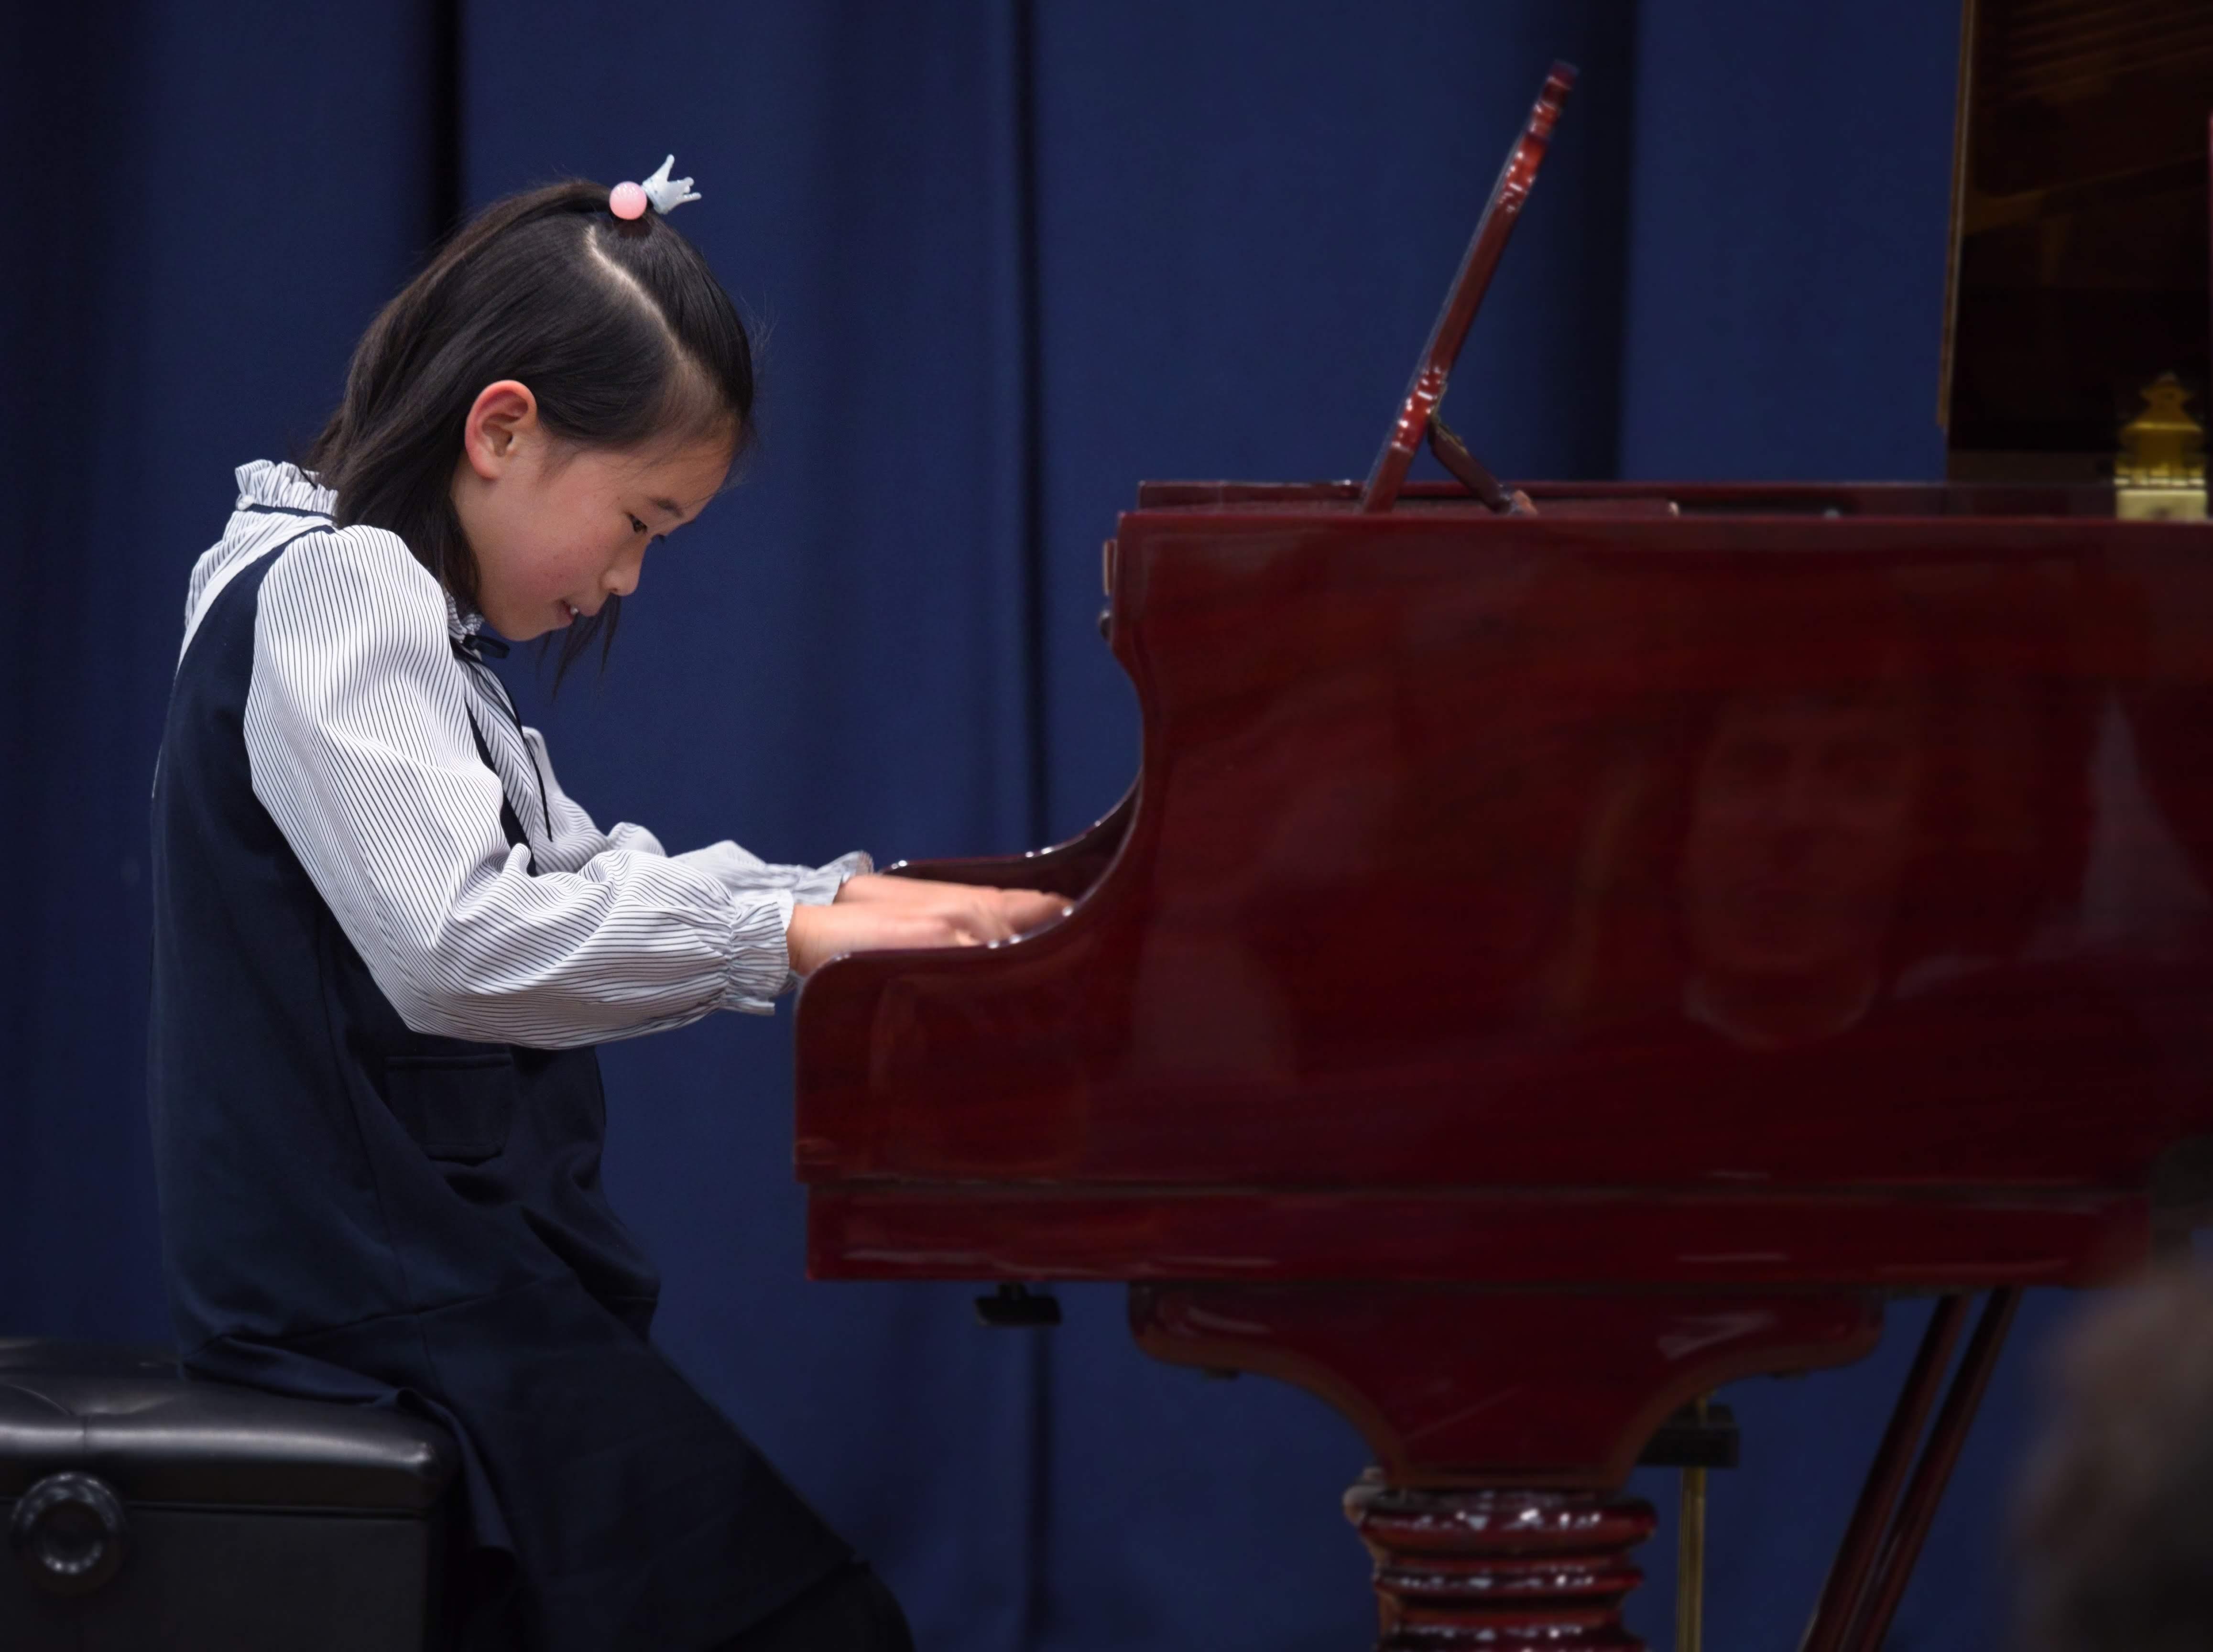 WGE Pianoforte Day 1 Serenity Lao Displays her skills on the Piano